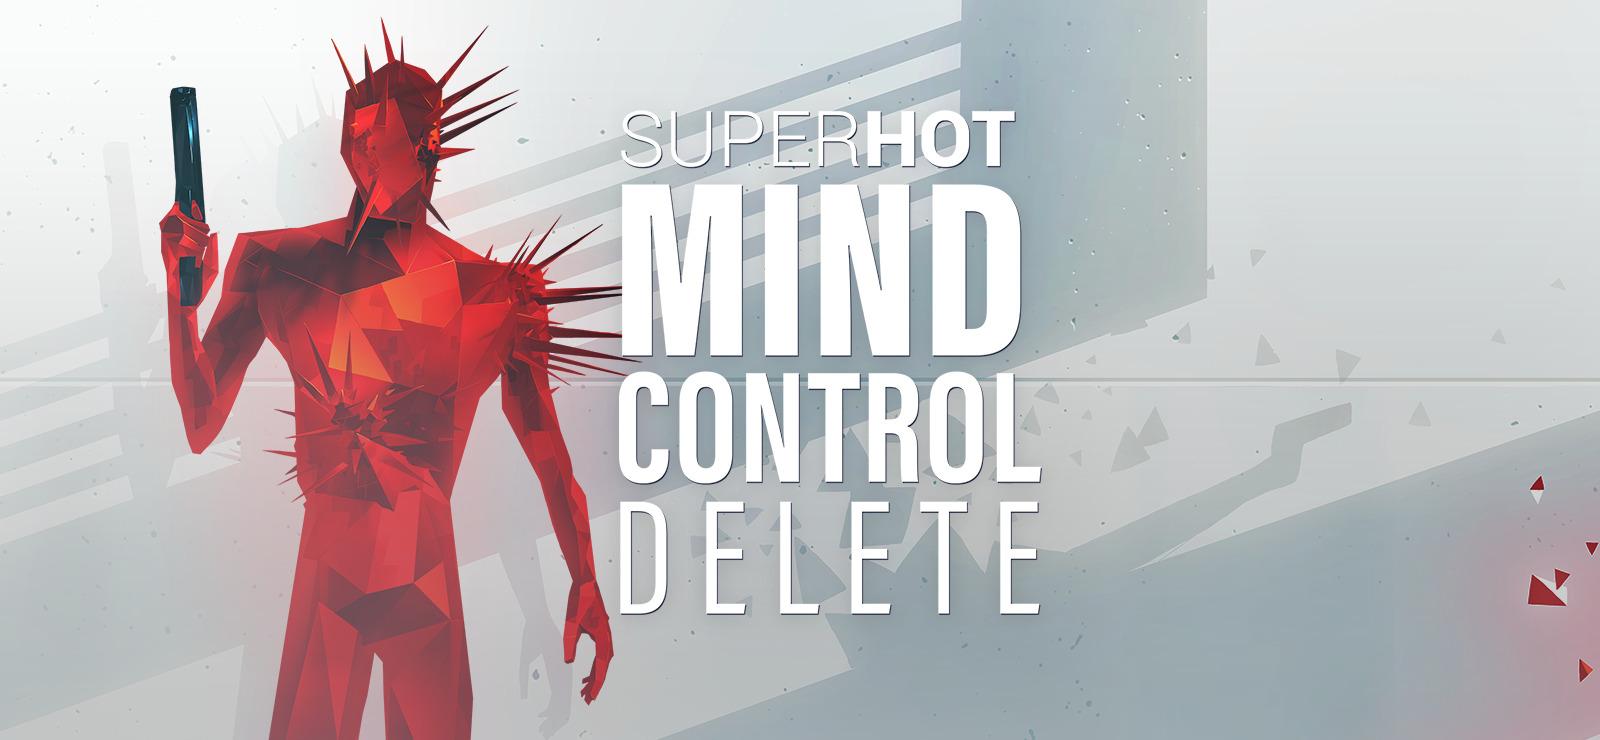 SUPERHOT MIND CONTROL DELETE-GOG